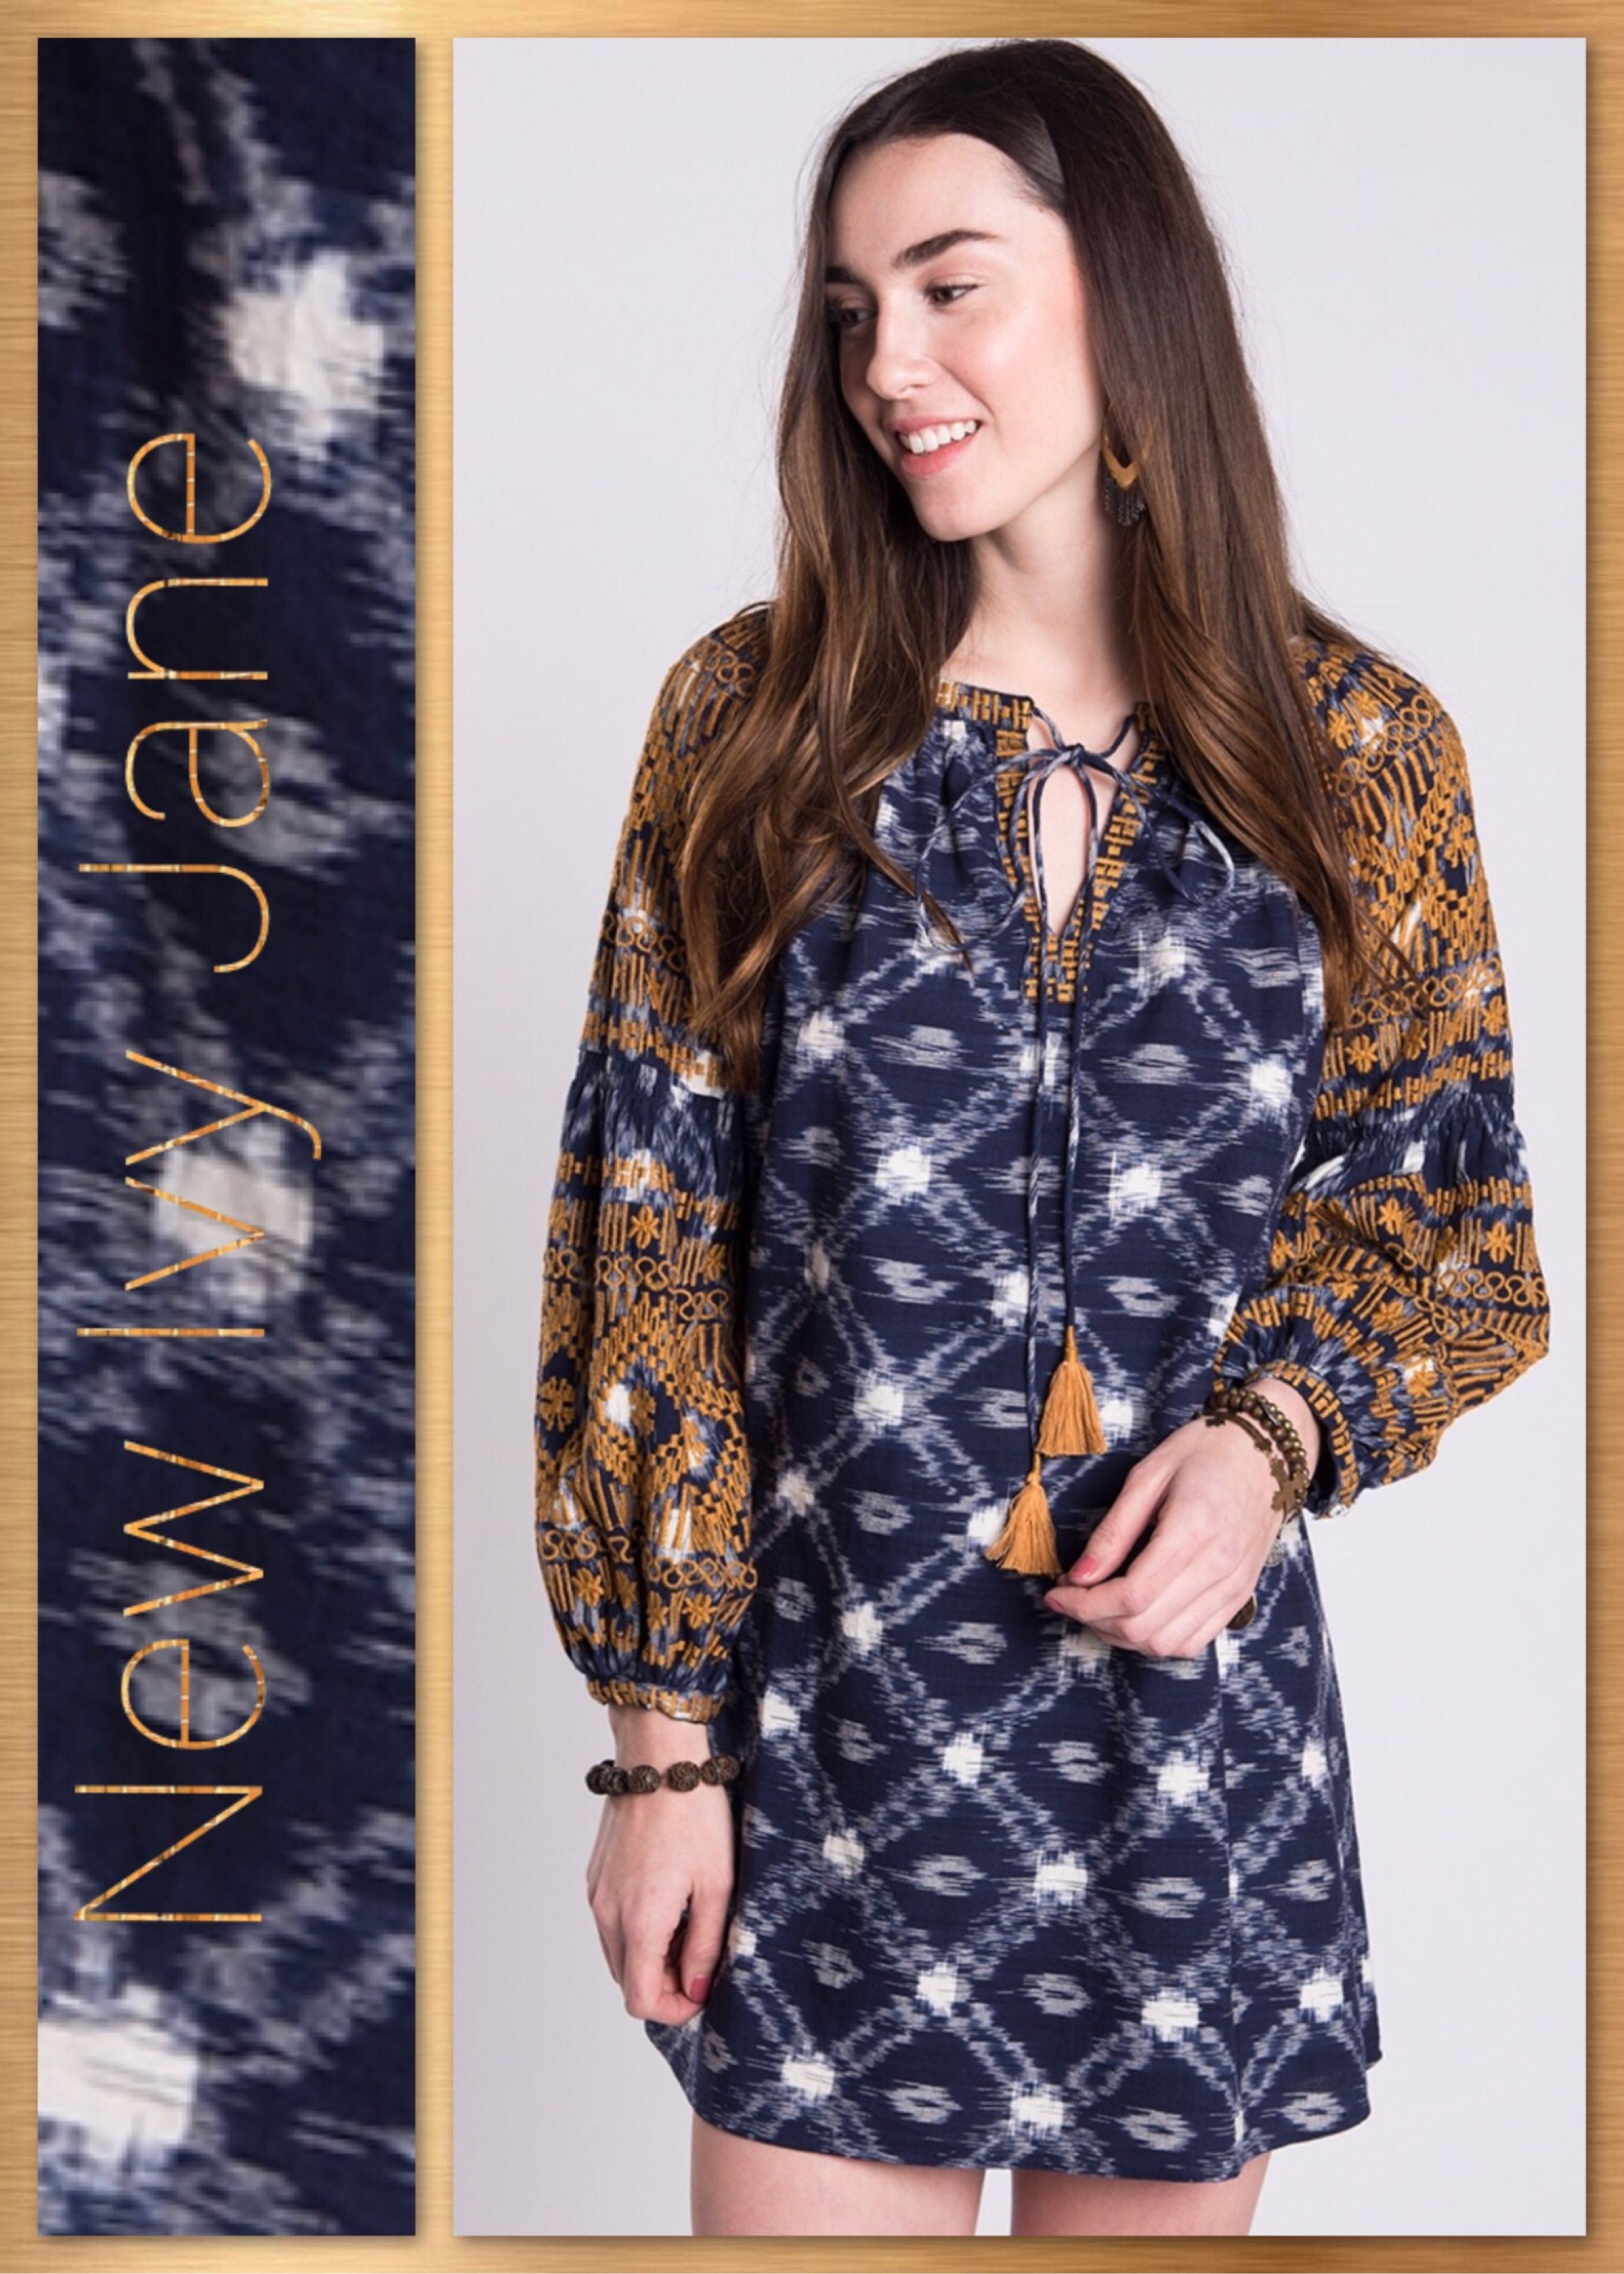 c356439983f This Cute Tunic dress is Perfect for Fall Fun. #IvyJane #BoHoChic  #Fall2017Fashion